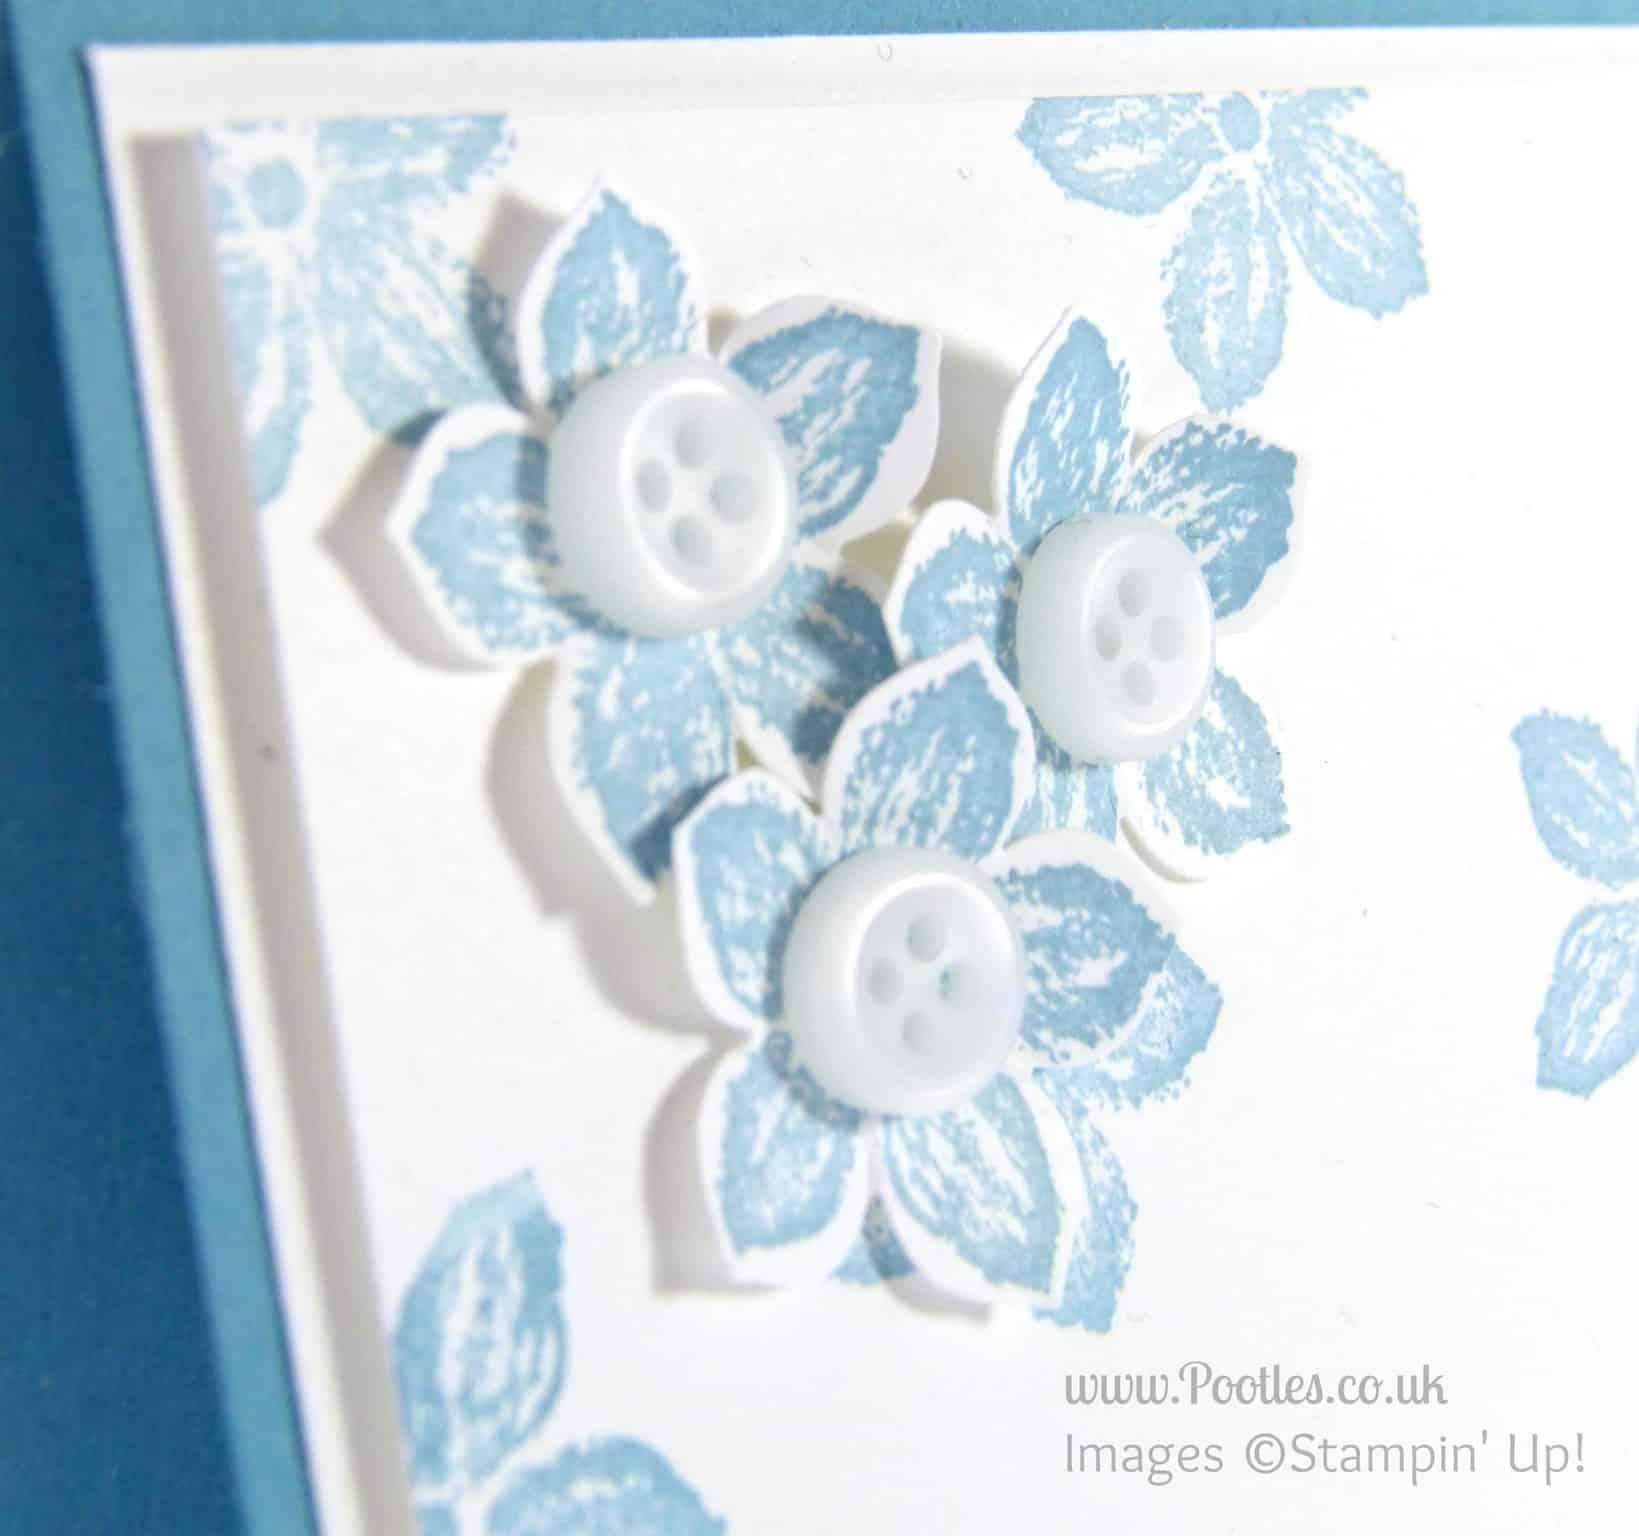 Stampin' Up! UK Independent Demonstrator - Pootles. Petite Sweet Baby Petals! Flower Detail